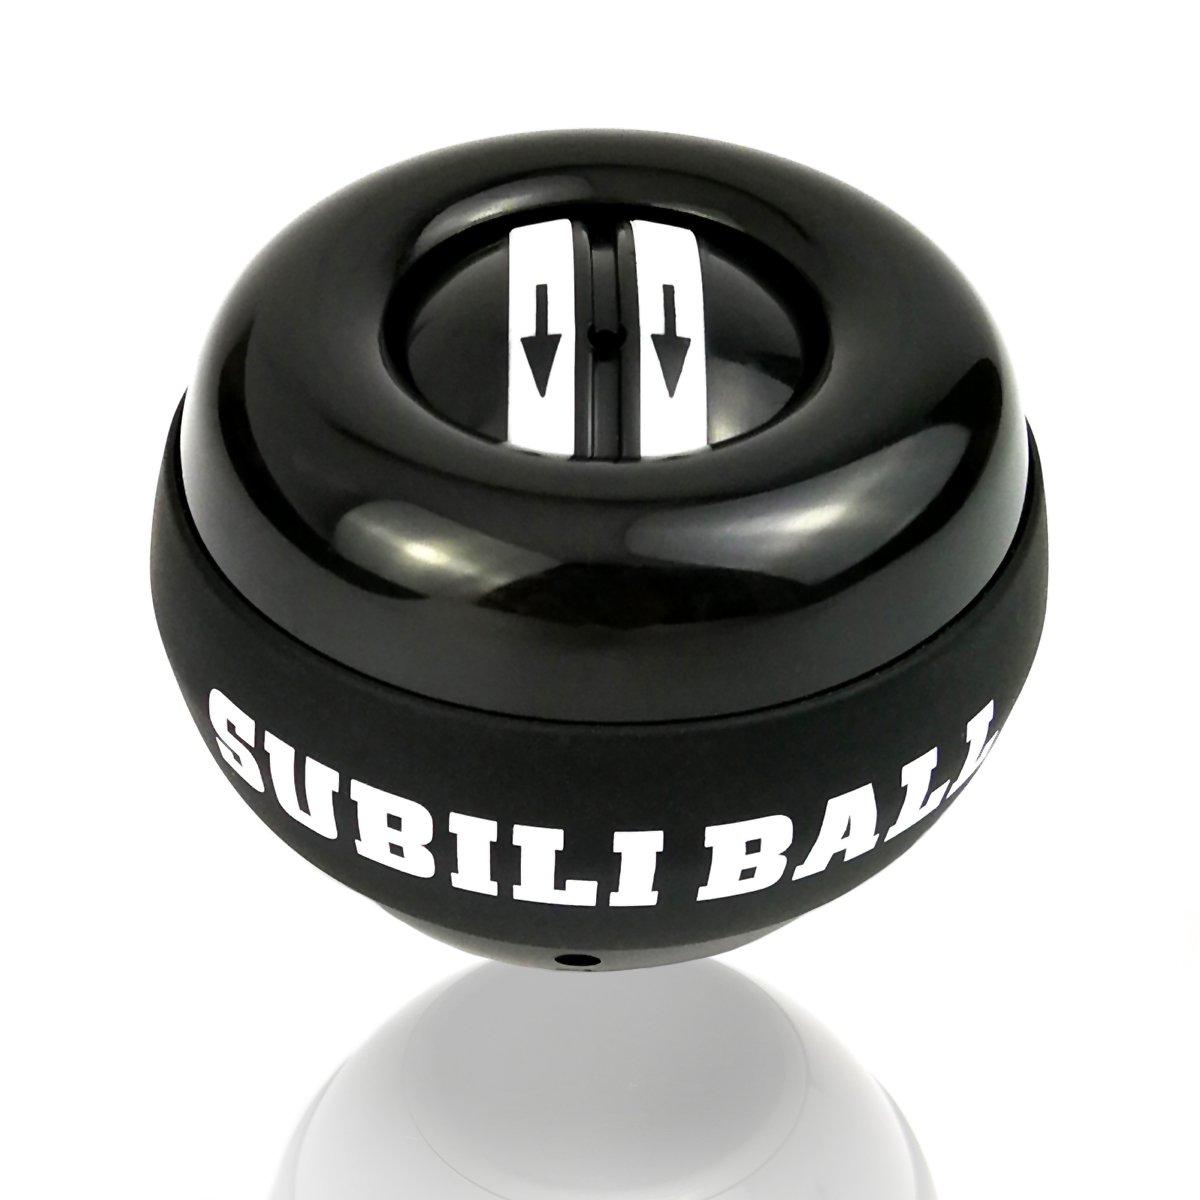 [Upgraded] Yusam Auto-Start Wrist Trainer LED Wrist Ball Exerciser Powerball Wrist Arm Strengthener Workout Toy Spinner Gyroscope Ball(Black)